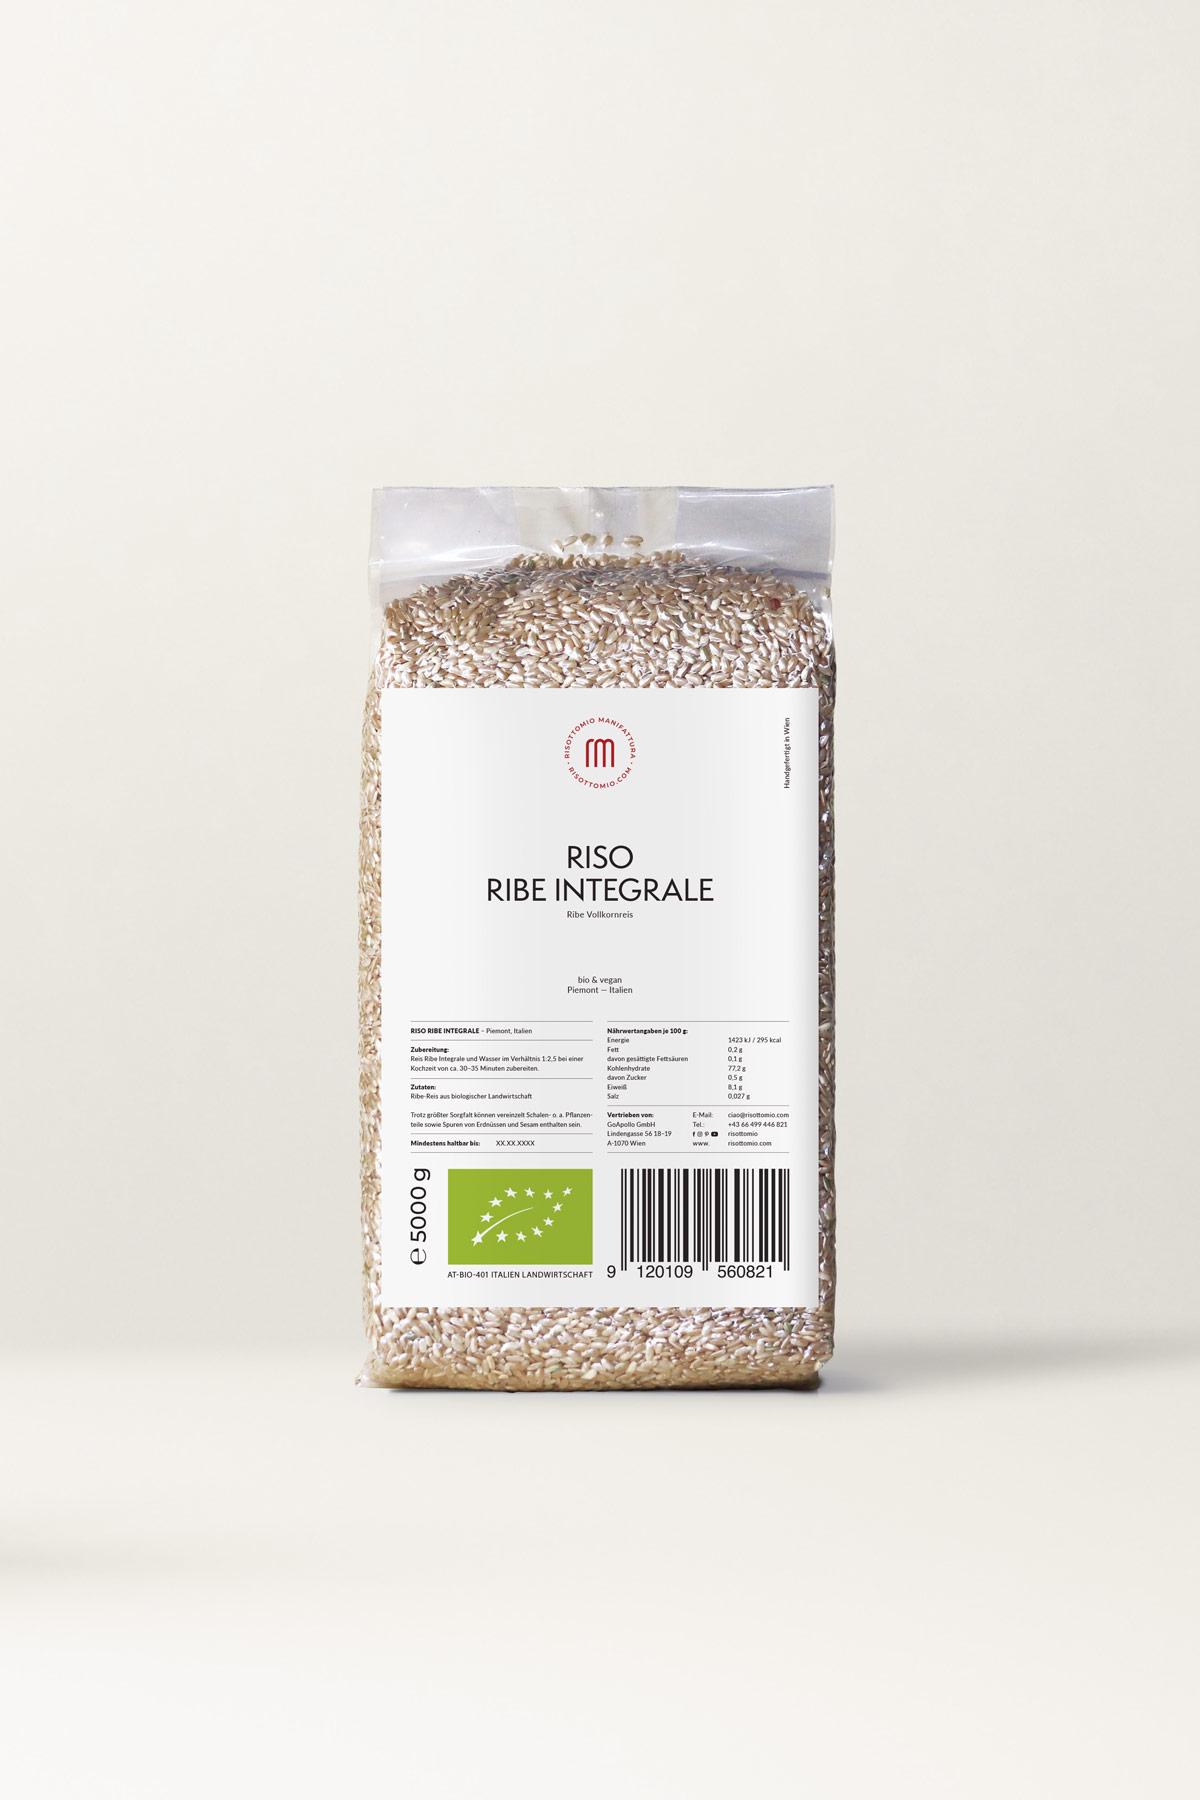 Ribe Integrale Reis – 5000g